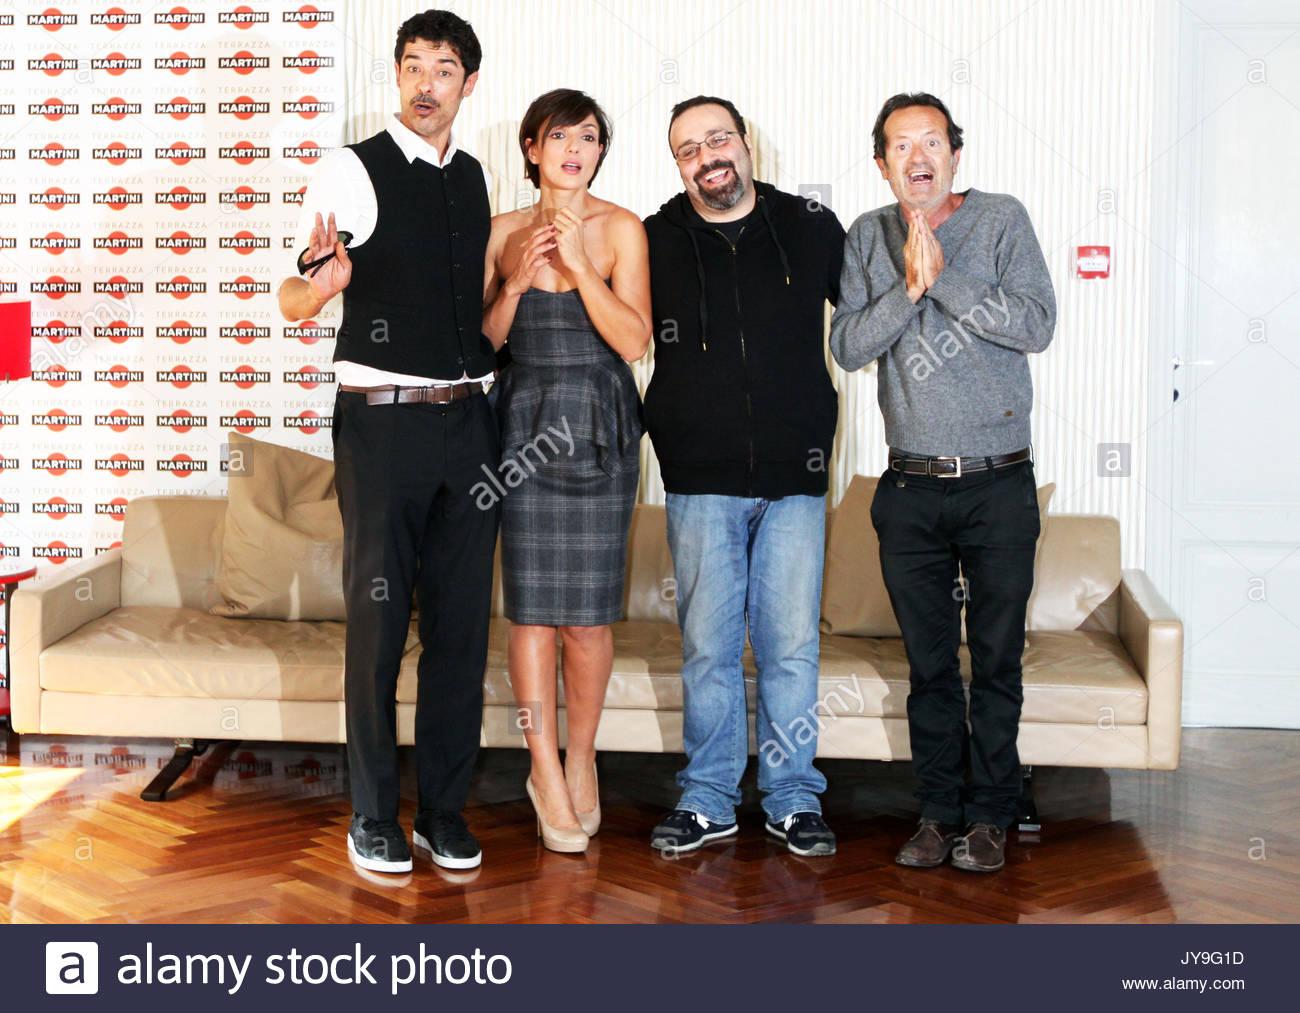 Ambra Angiolini, Rocco Papaleo, Alessandro Gasmann e Massimiliano ...